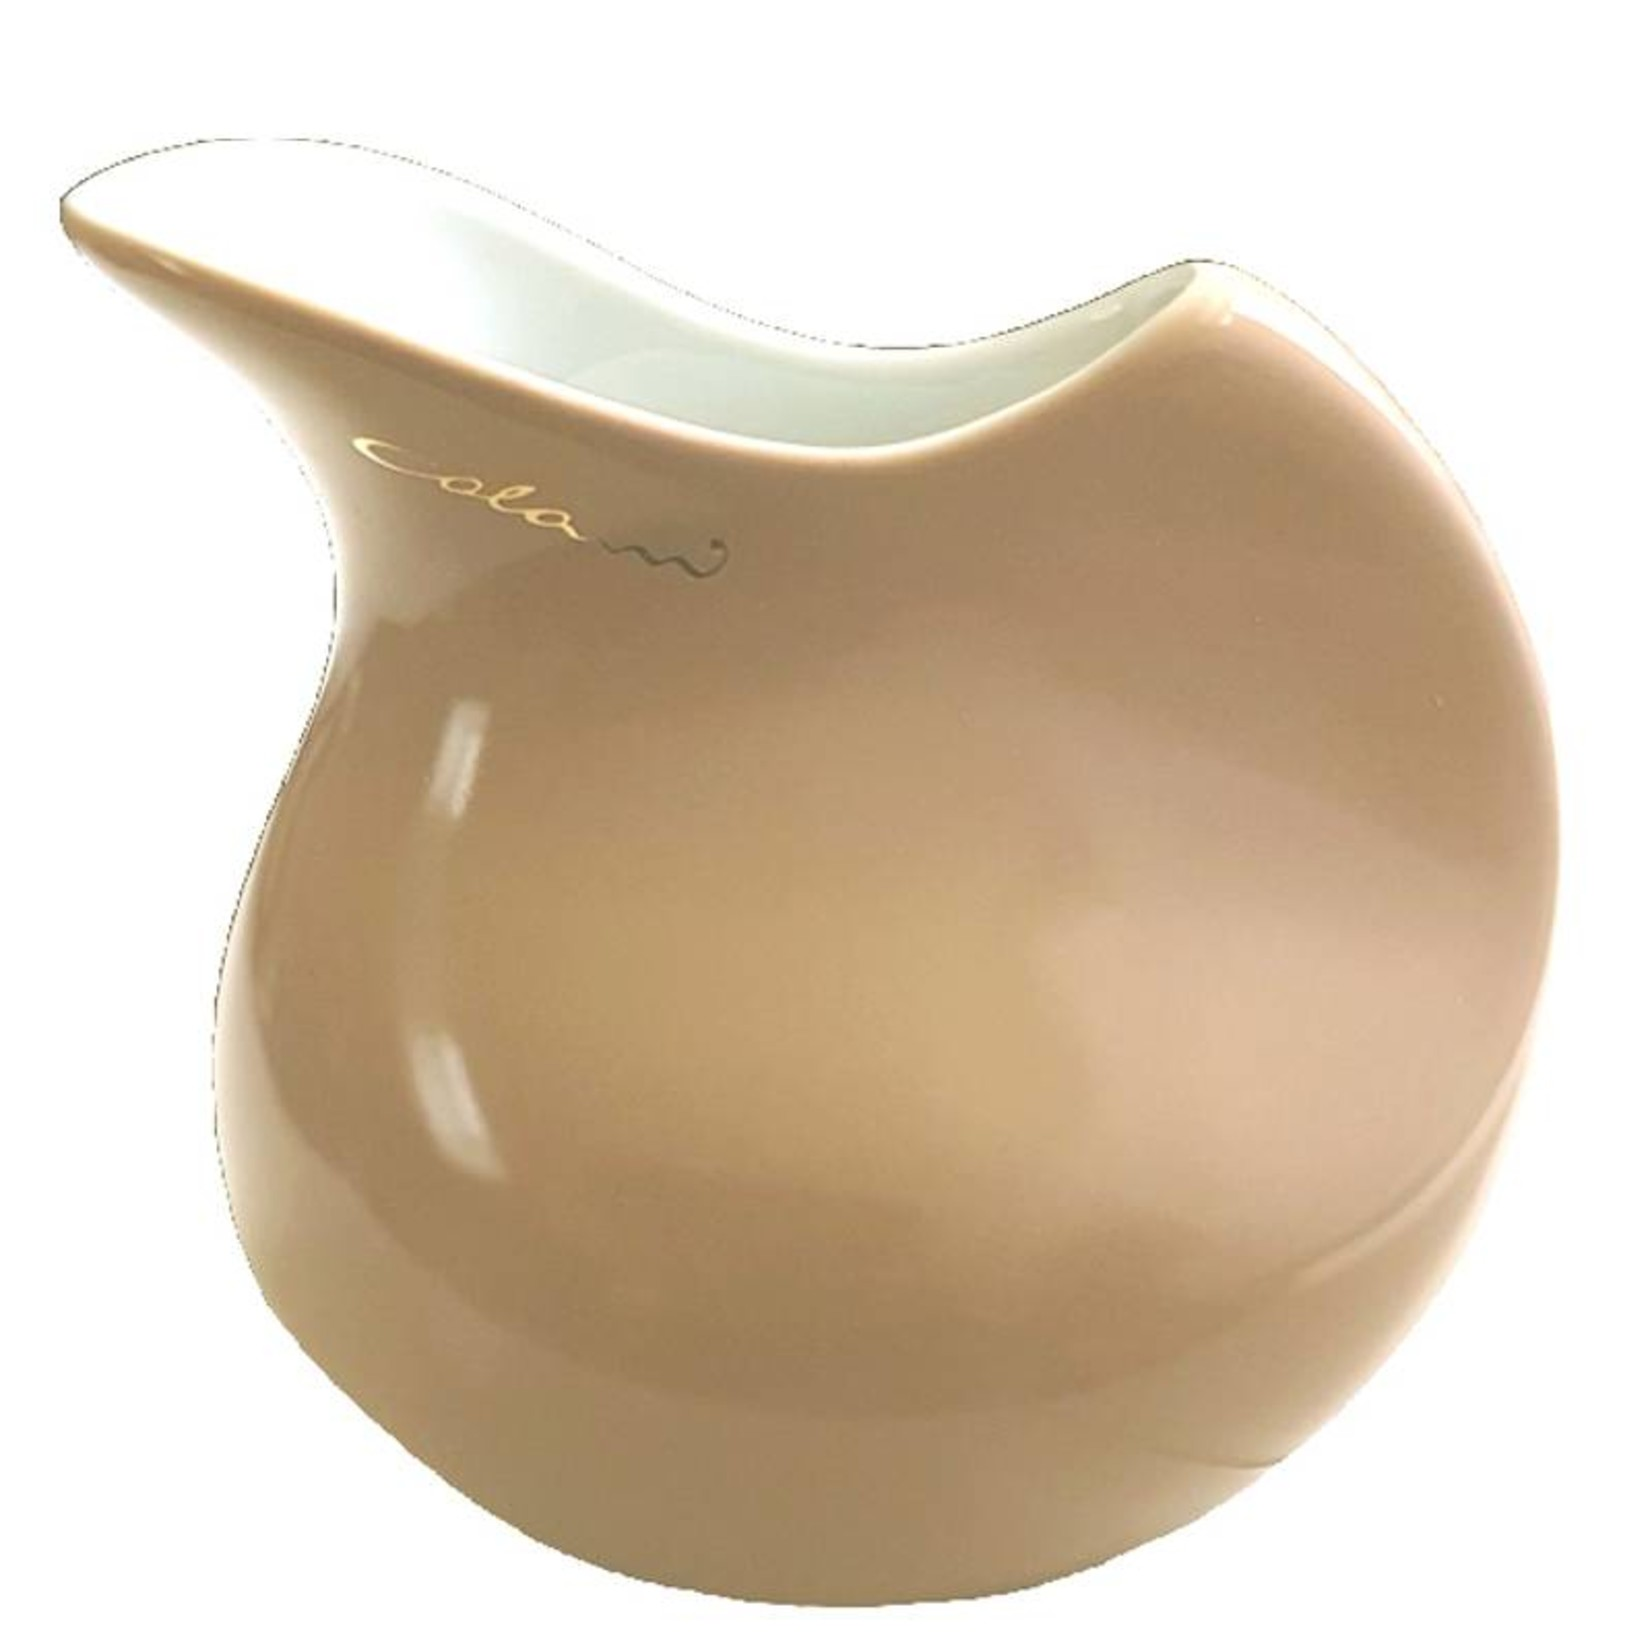 Colani Porzellanserie Colani Sahnegießer I sand I Milchkännchen I Porzellan